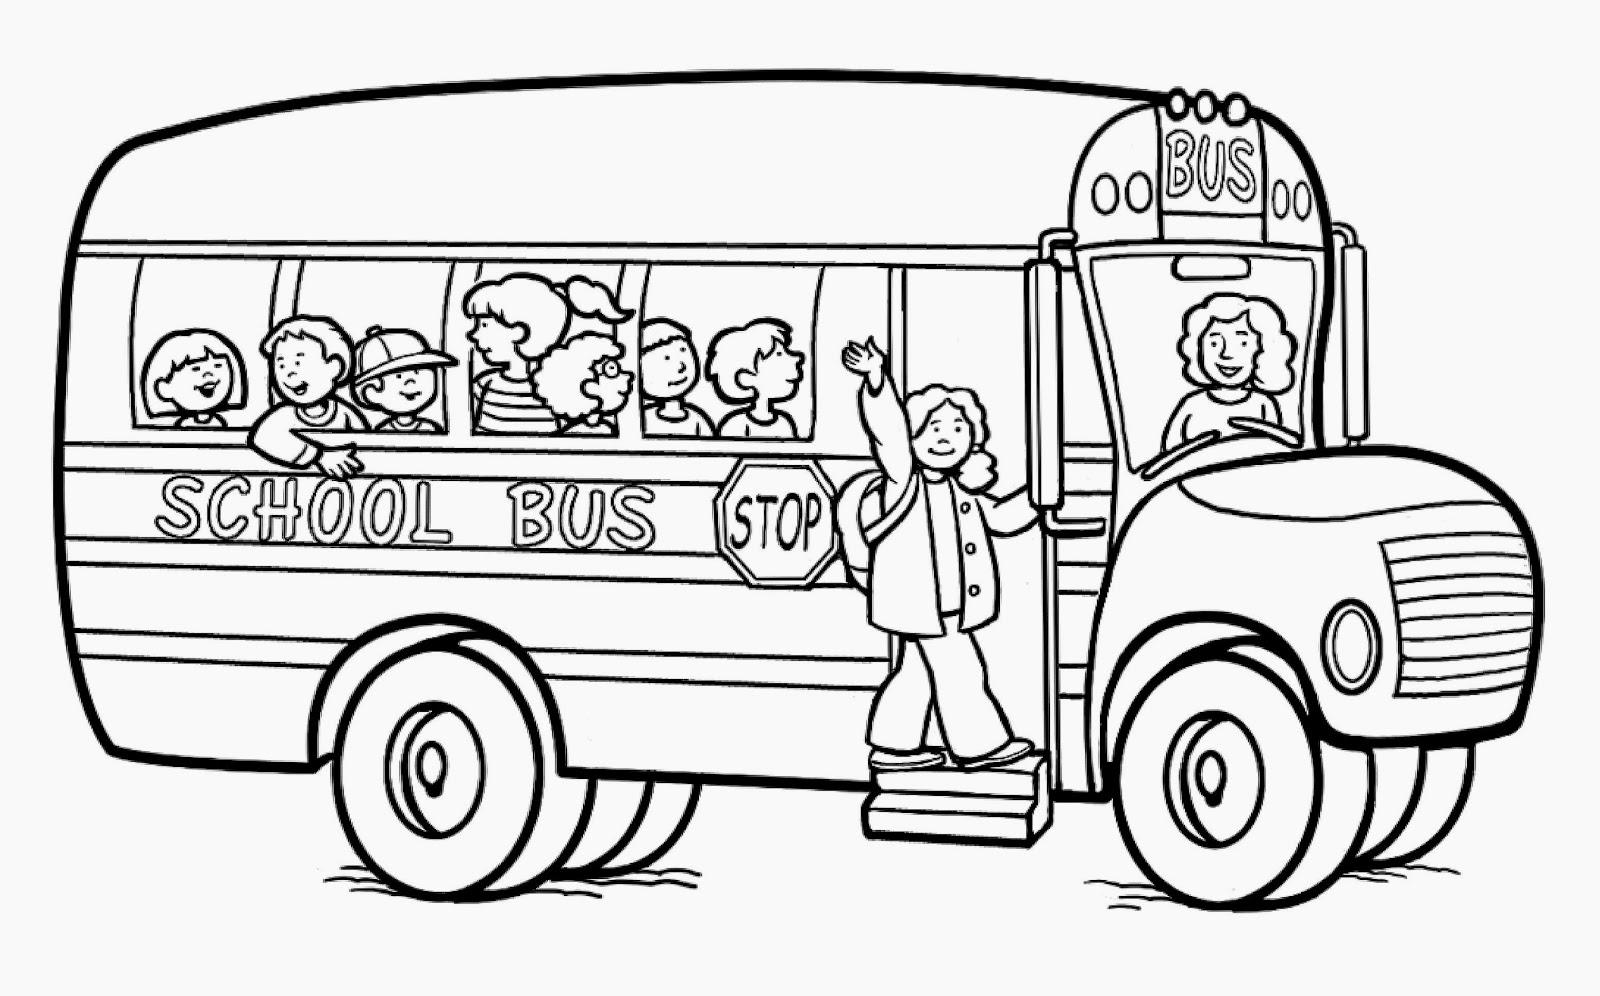 printable school bus coloring pages dqfk16 school bus printable